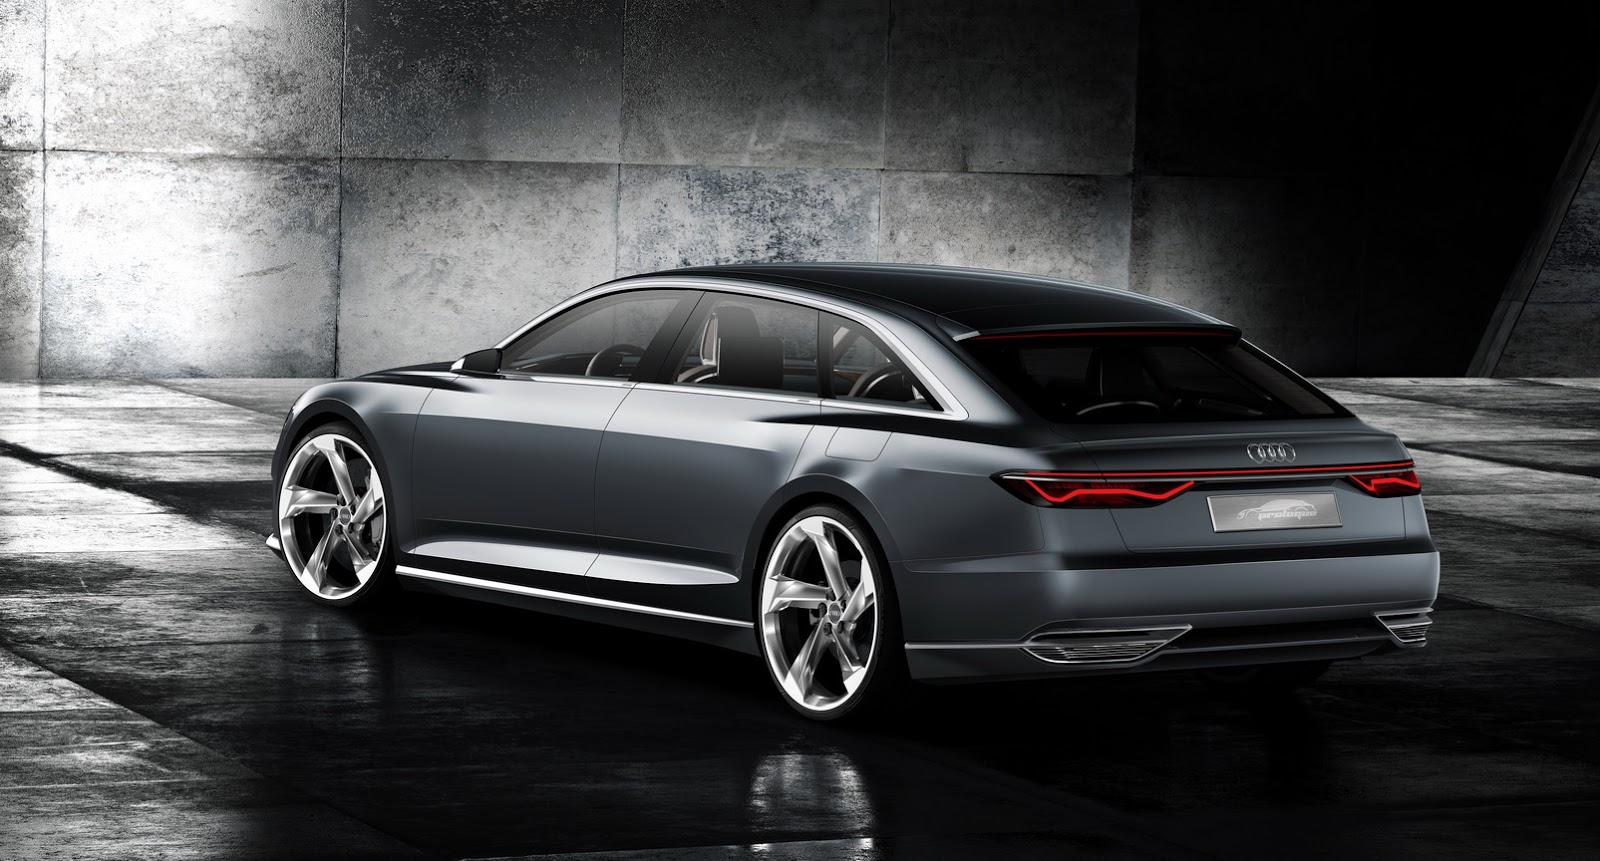 Von stefan grundhoff am 15.06.2019. 2018 Audi A8 Considered For Full Electric Version